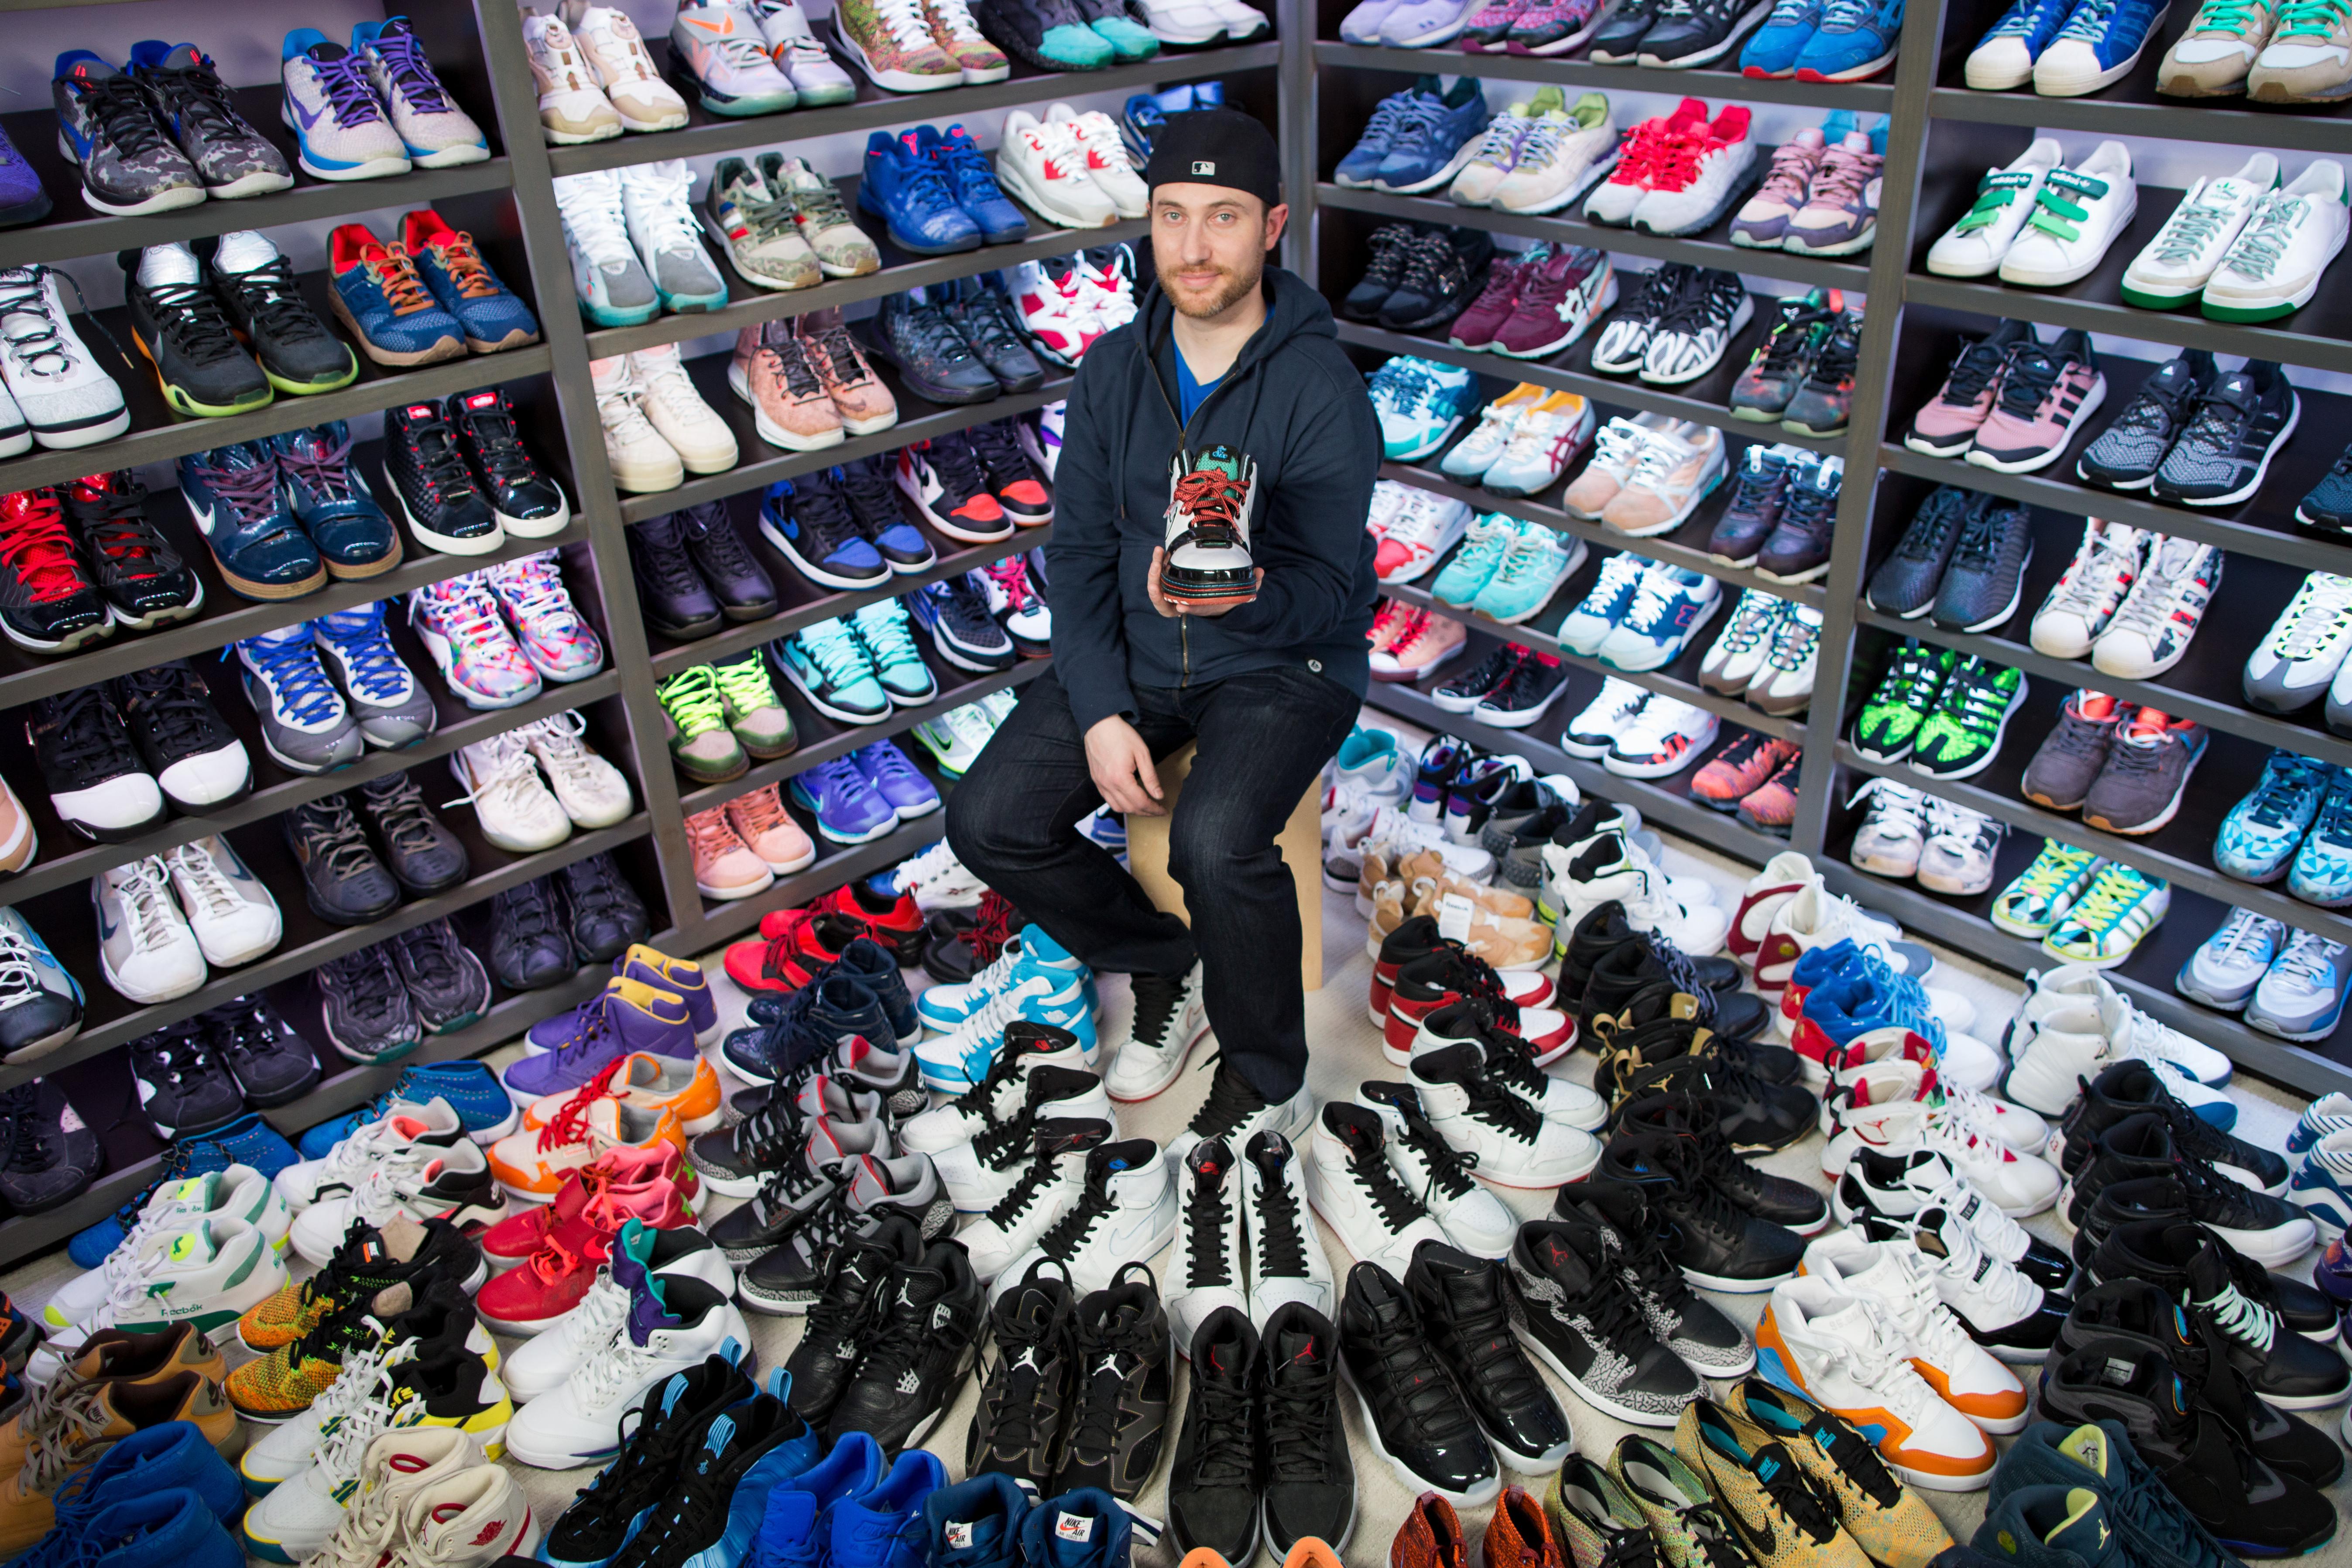 Josh closet